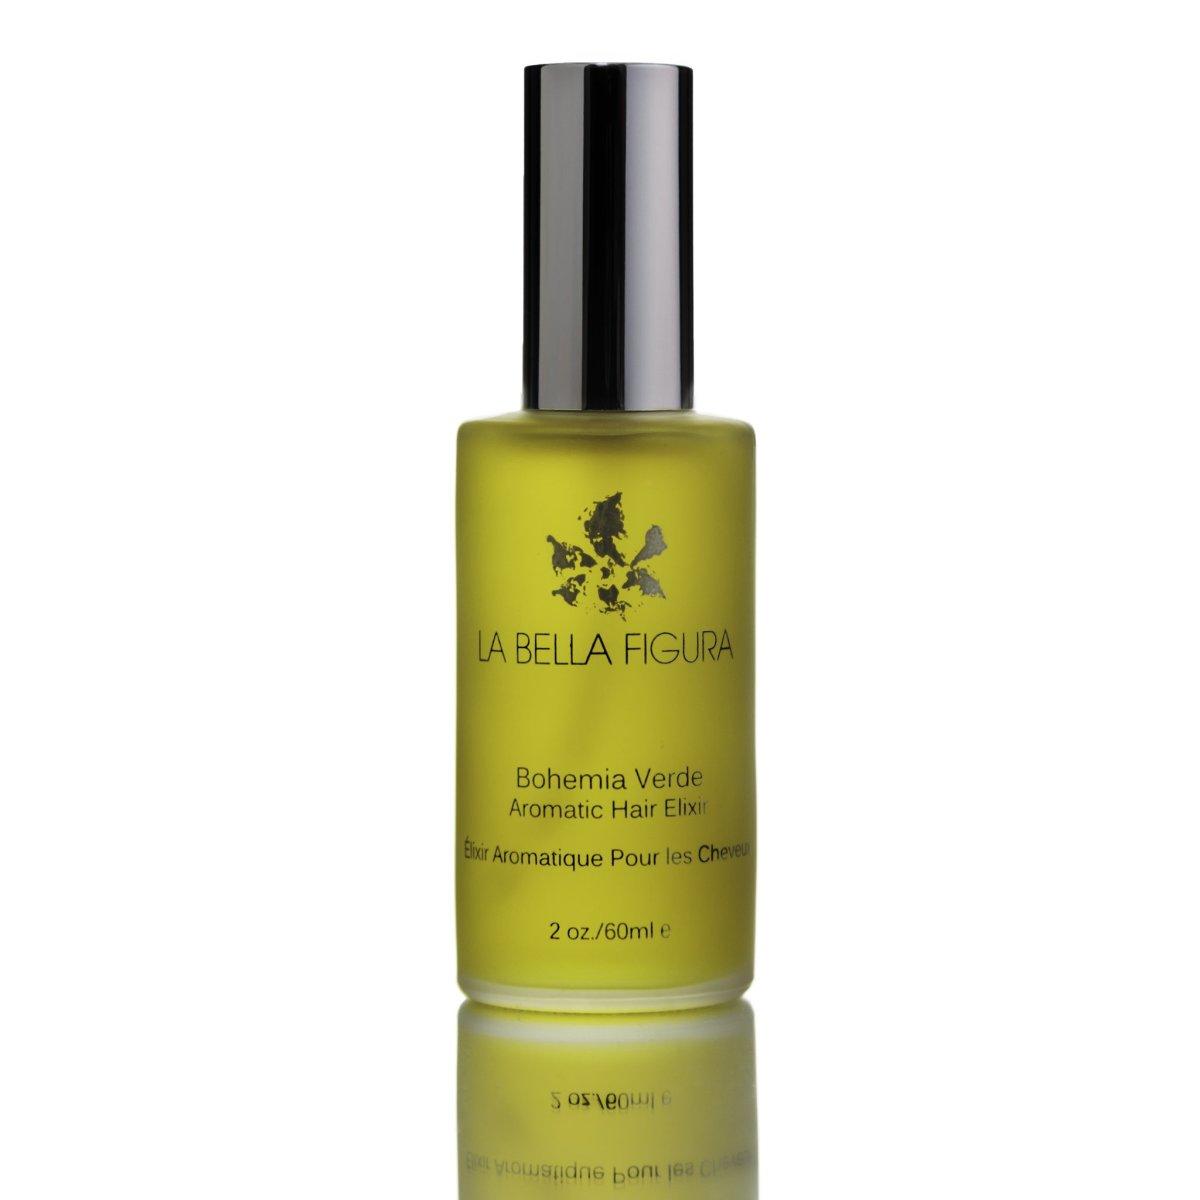 La Bella Figura Bohemia Verde Aromatic Hair Elixir